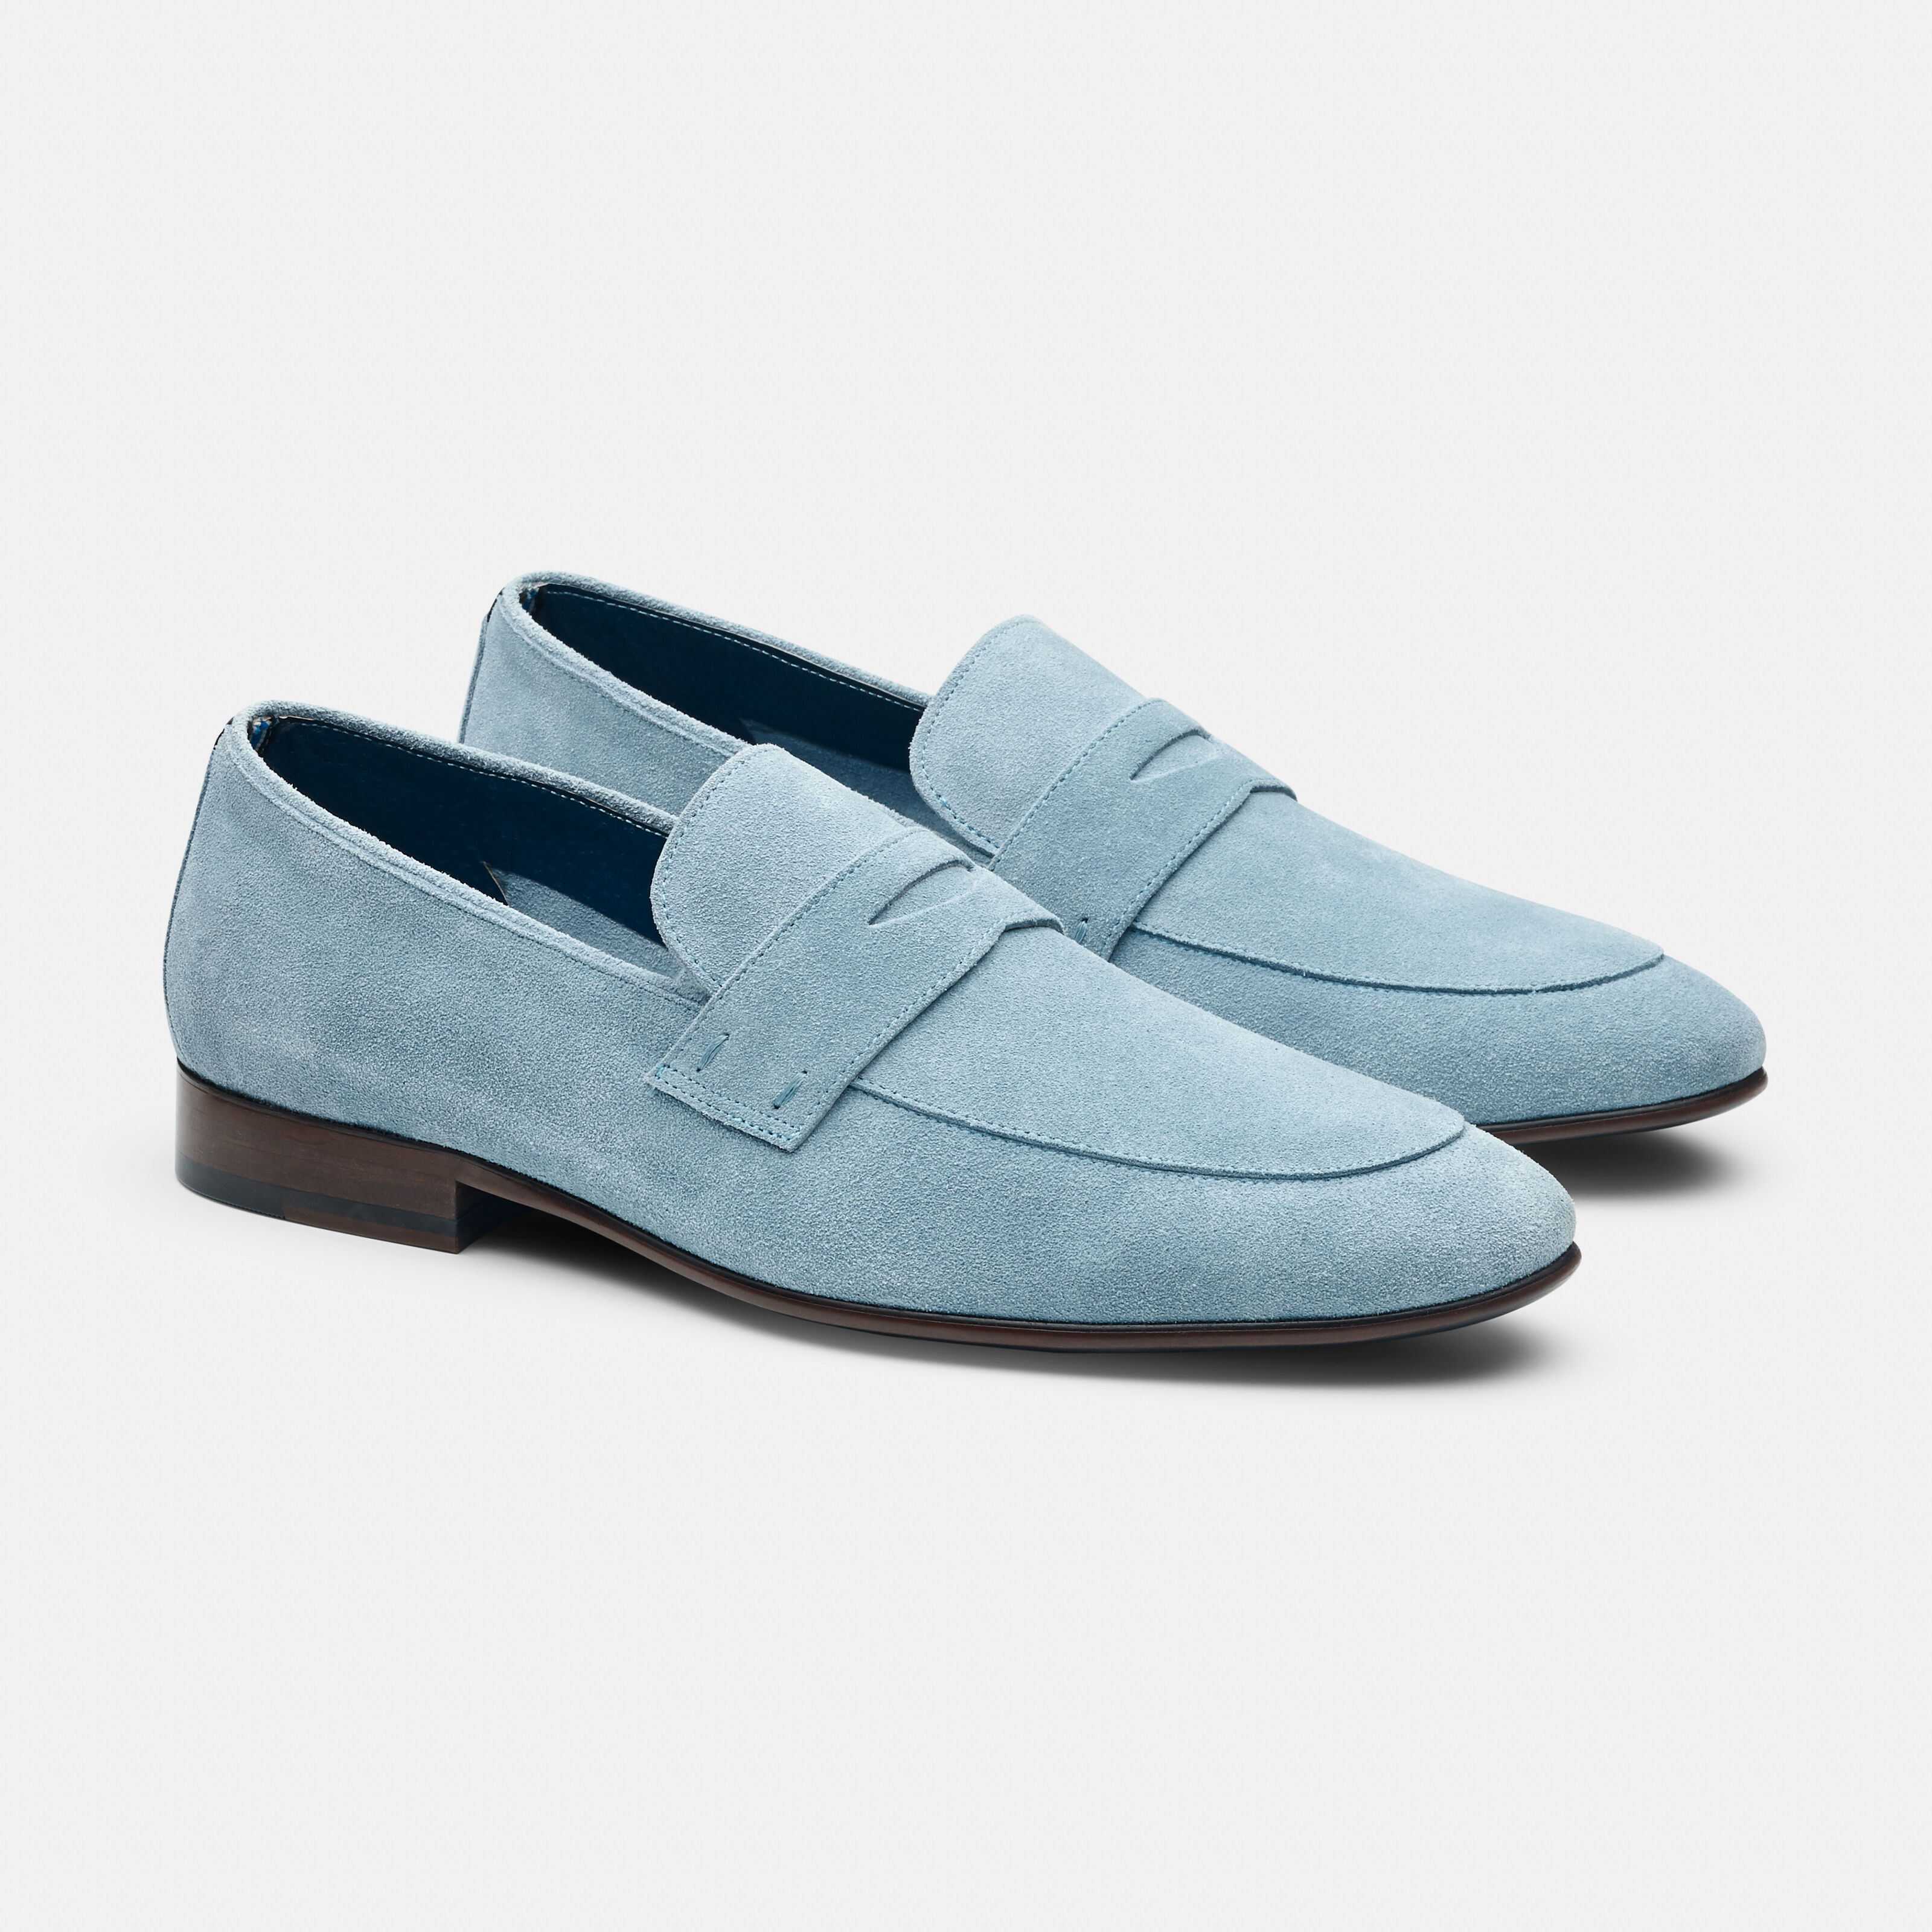 Blue Suede Shoes Dress Loafer